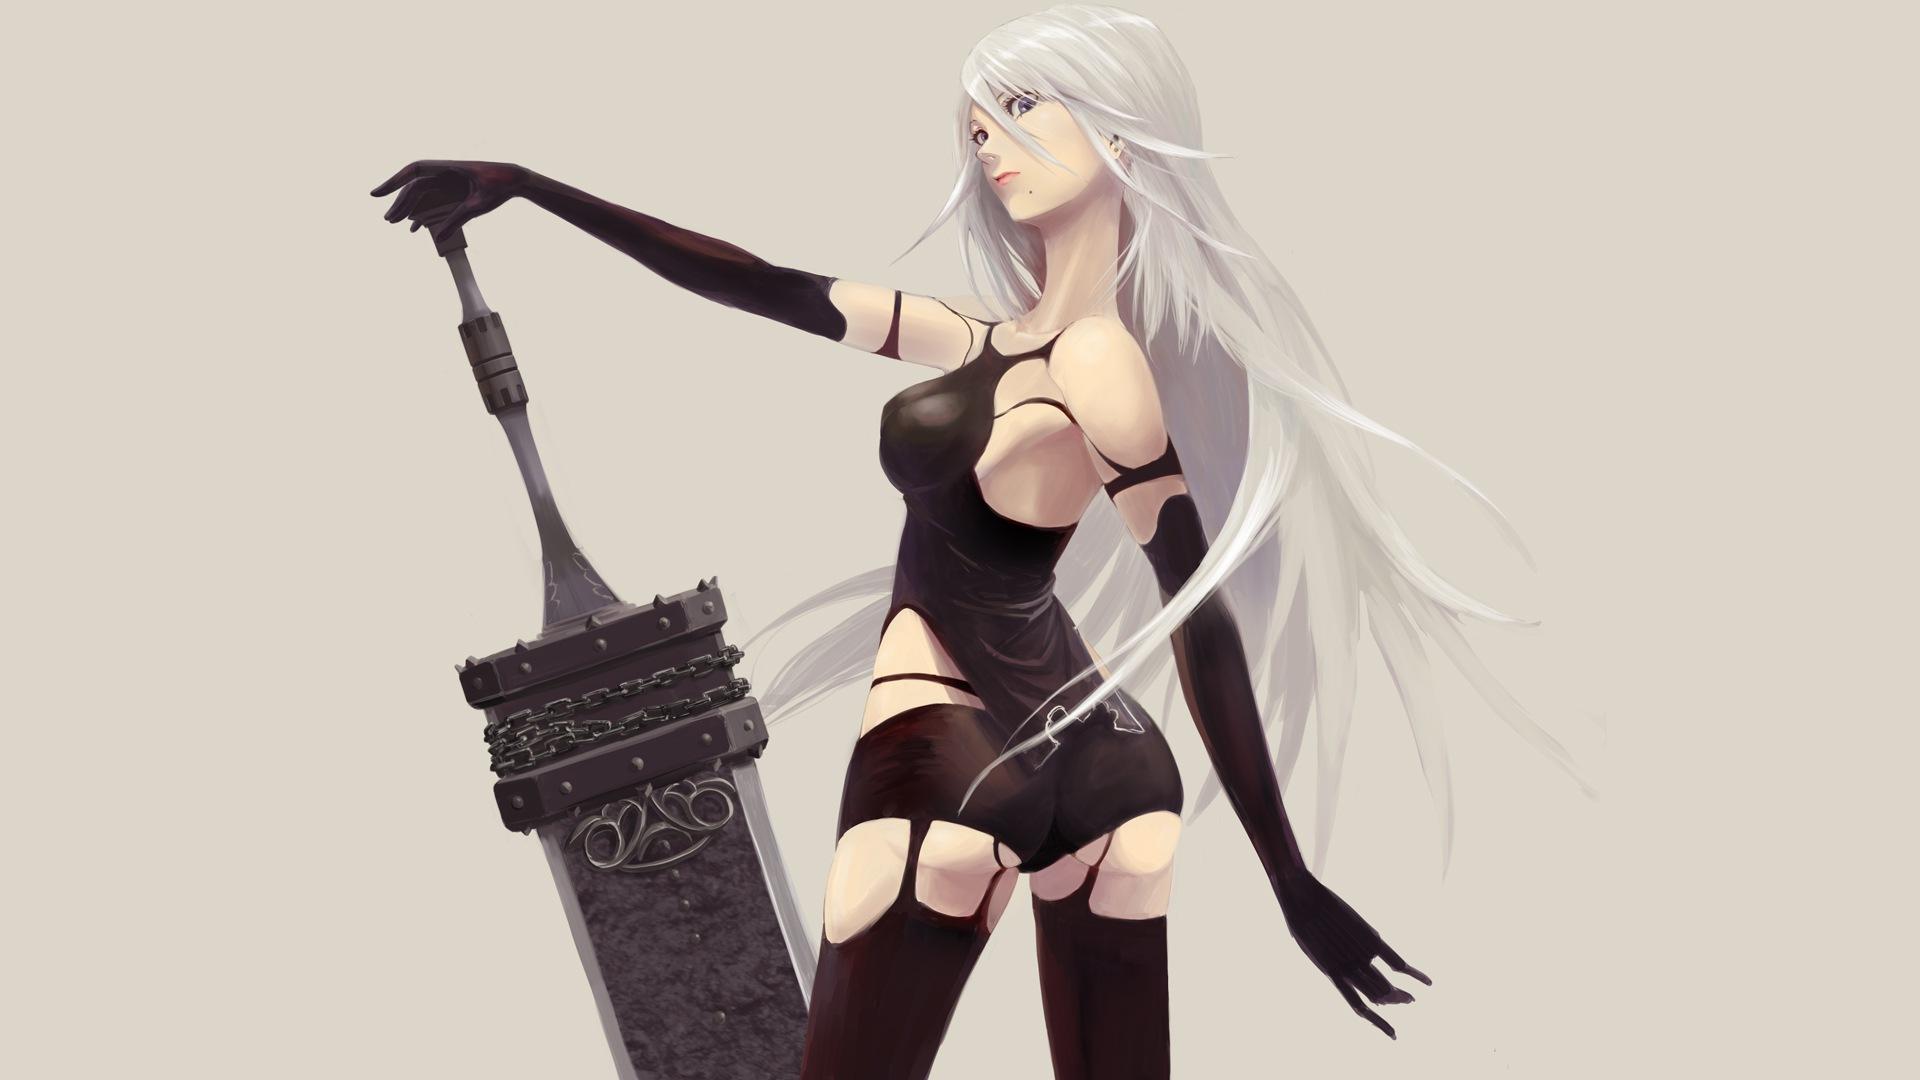 Desktop Wallpaper Yorha A2 Nier Automata Video Game Girl Warrior Hd Image Picture Background Zac0ry